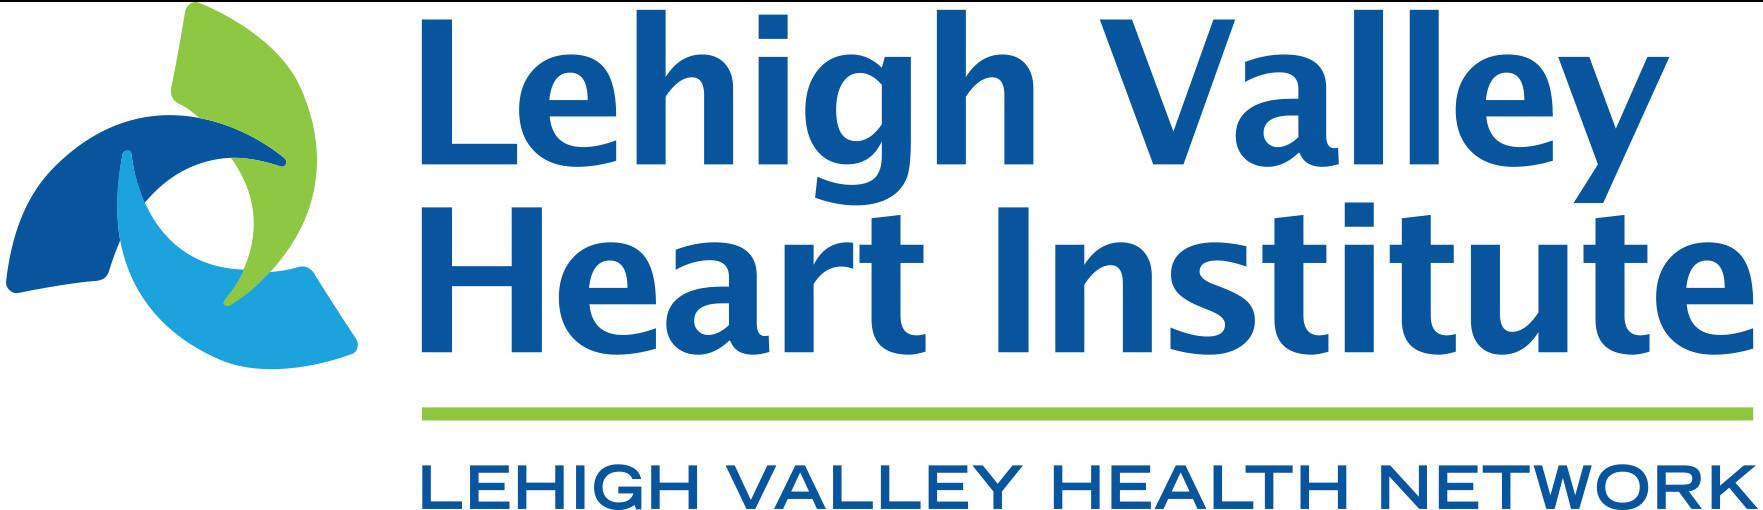 Lehigh Valley Heart Institute (Lehigh Valley Health Network)